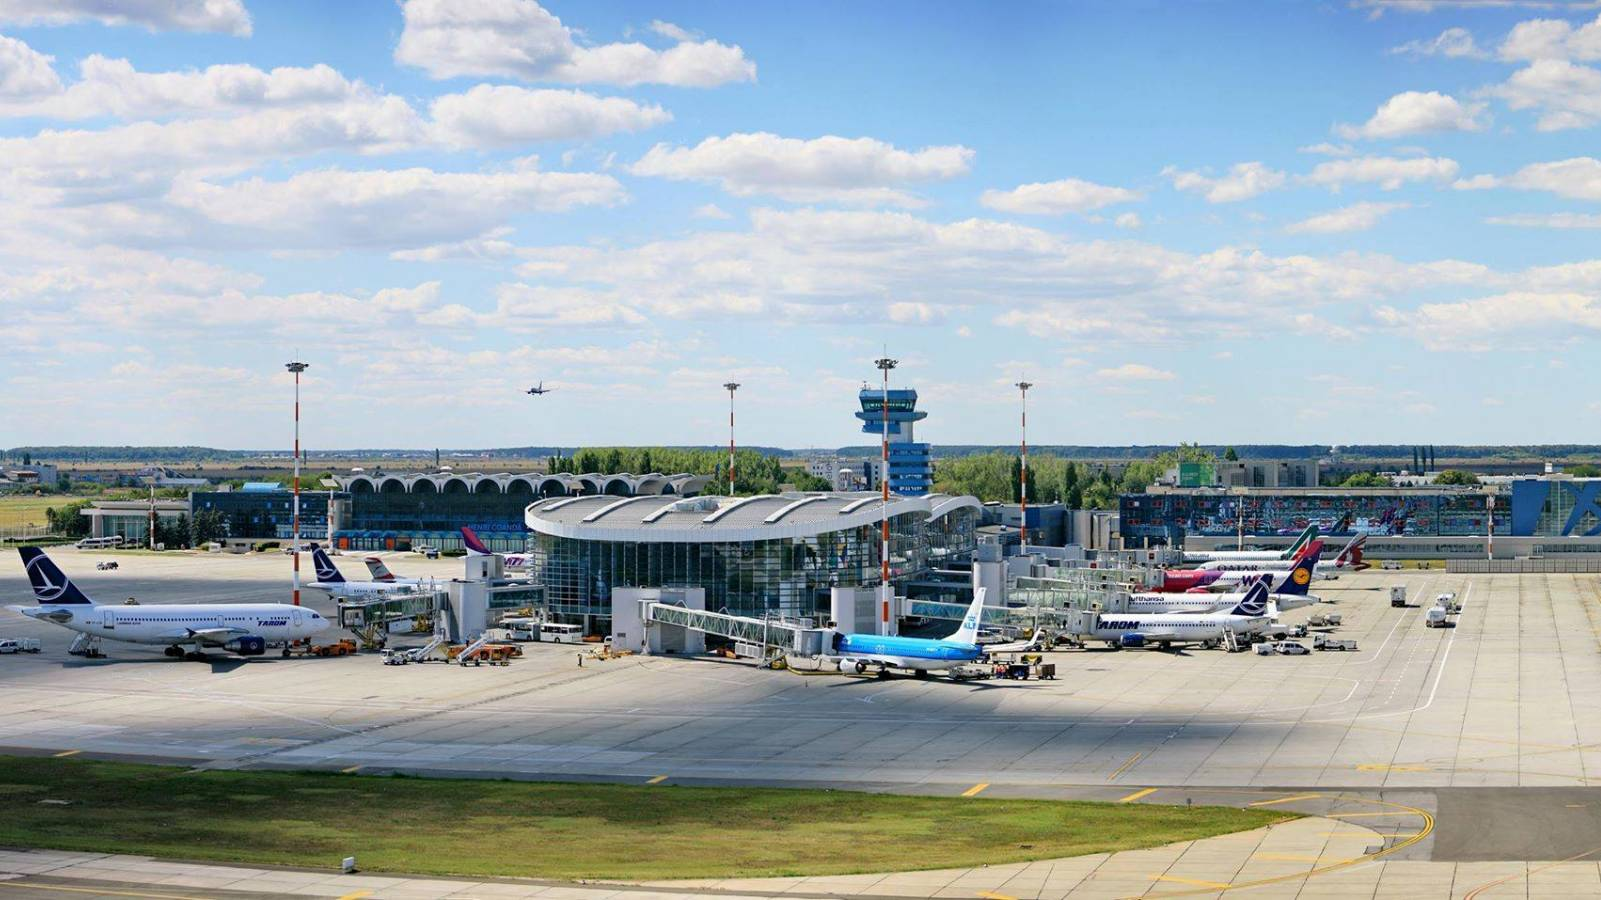 Aeroportul Otopeni Recunoastere Faciala